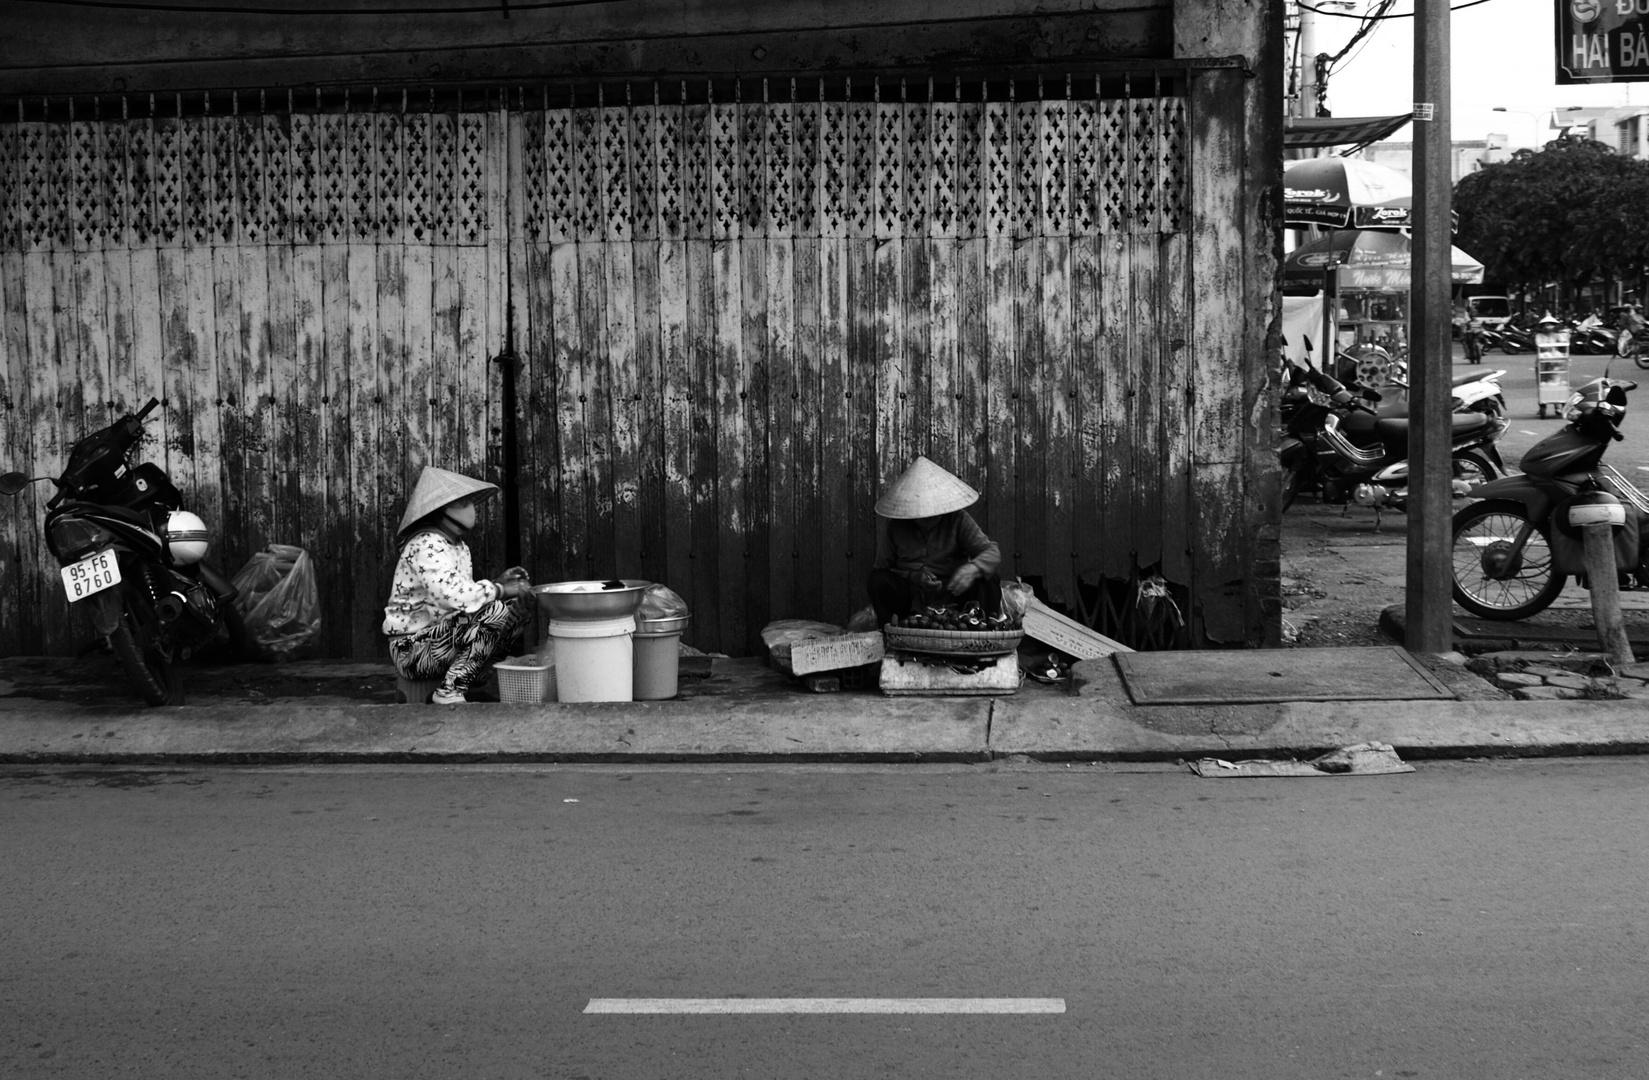 Street merchants